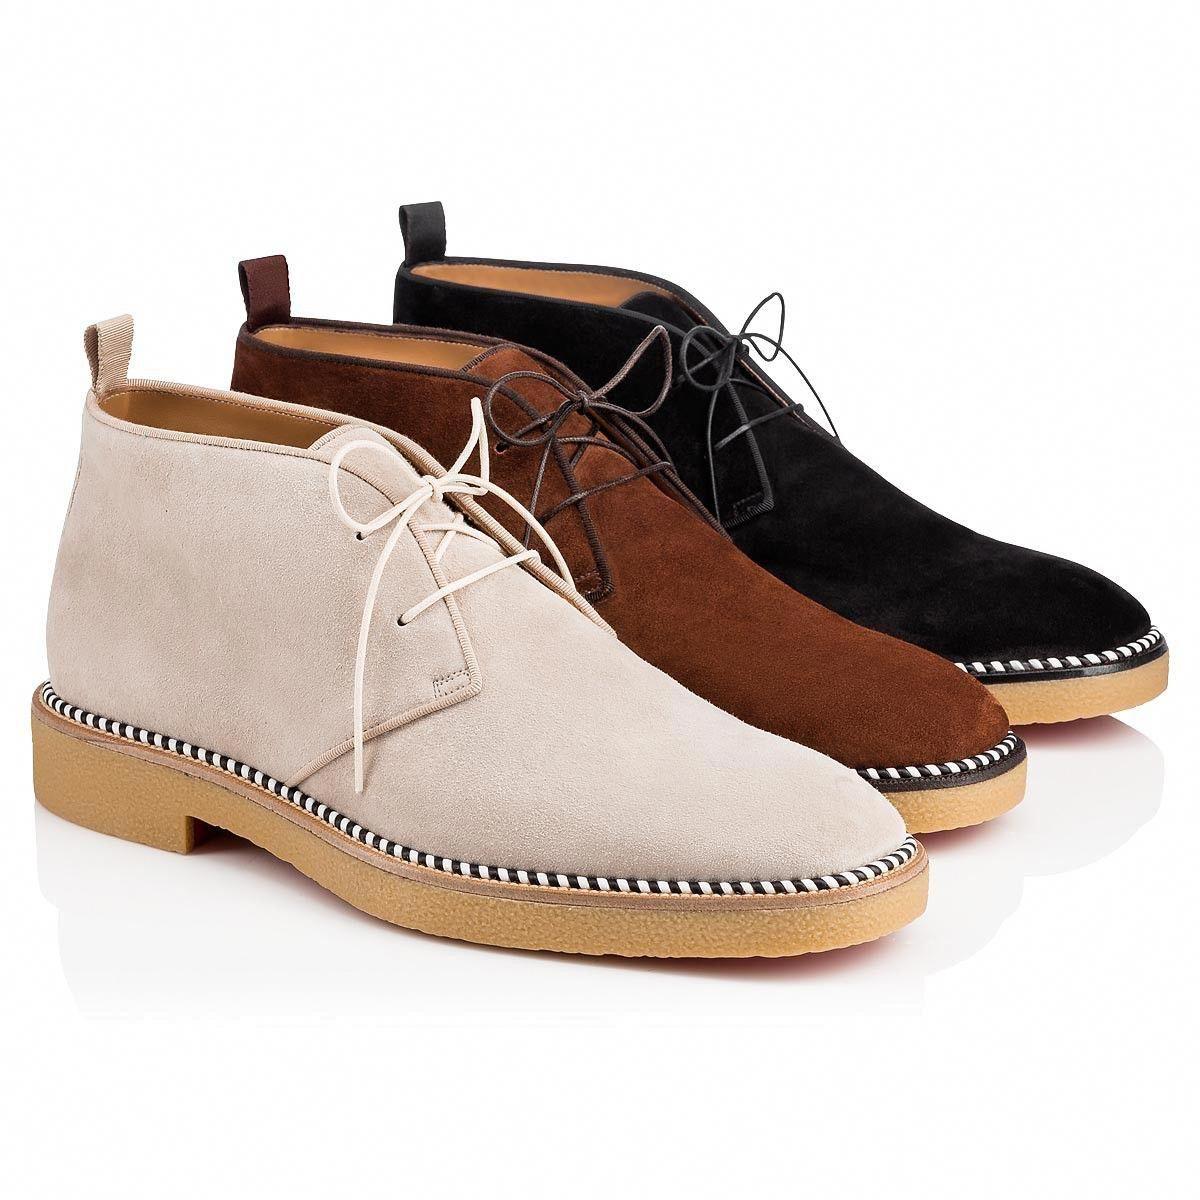 1438f4869ebd Shoes - Bruno Crepe Flat - Christian Louboutin  ChristianLouboutin ...